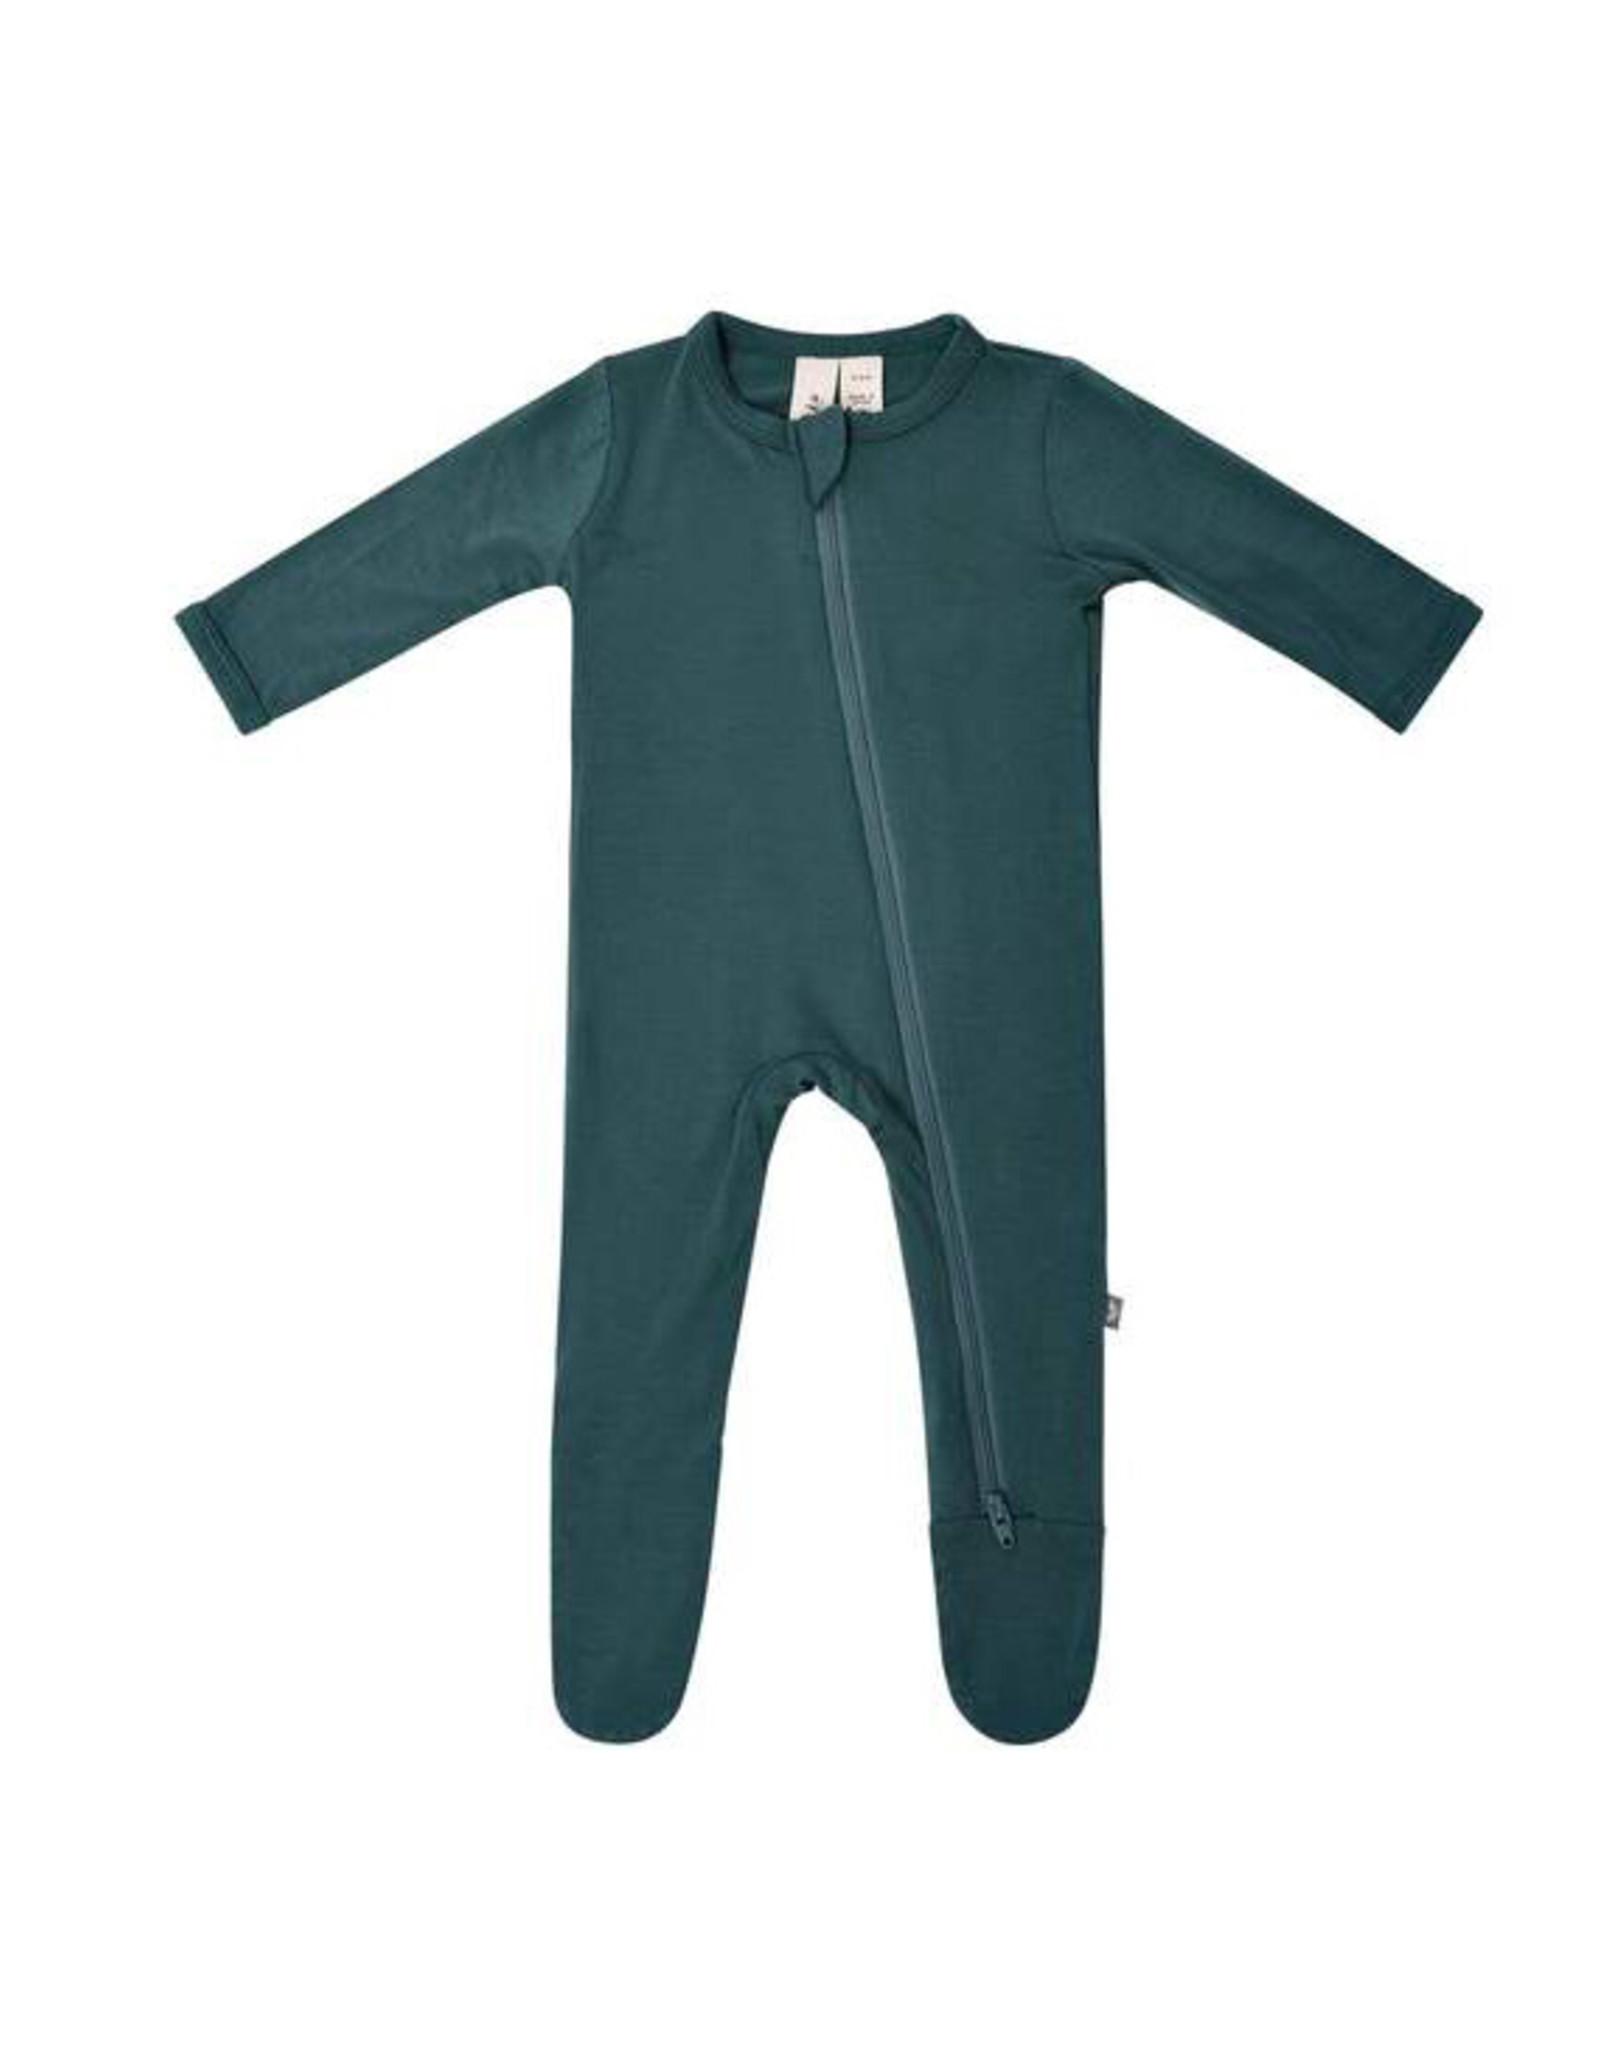 Kyte baby Kyte Baby Emerald zippered footie